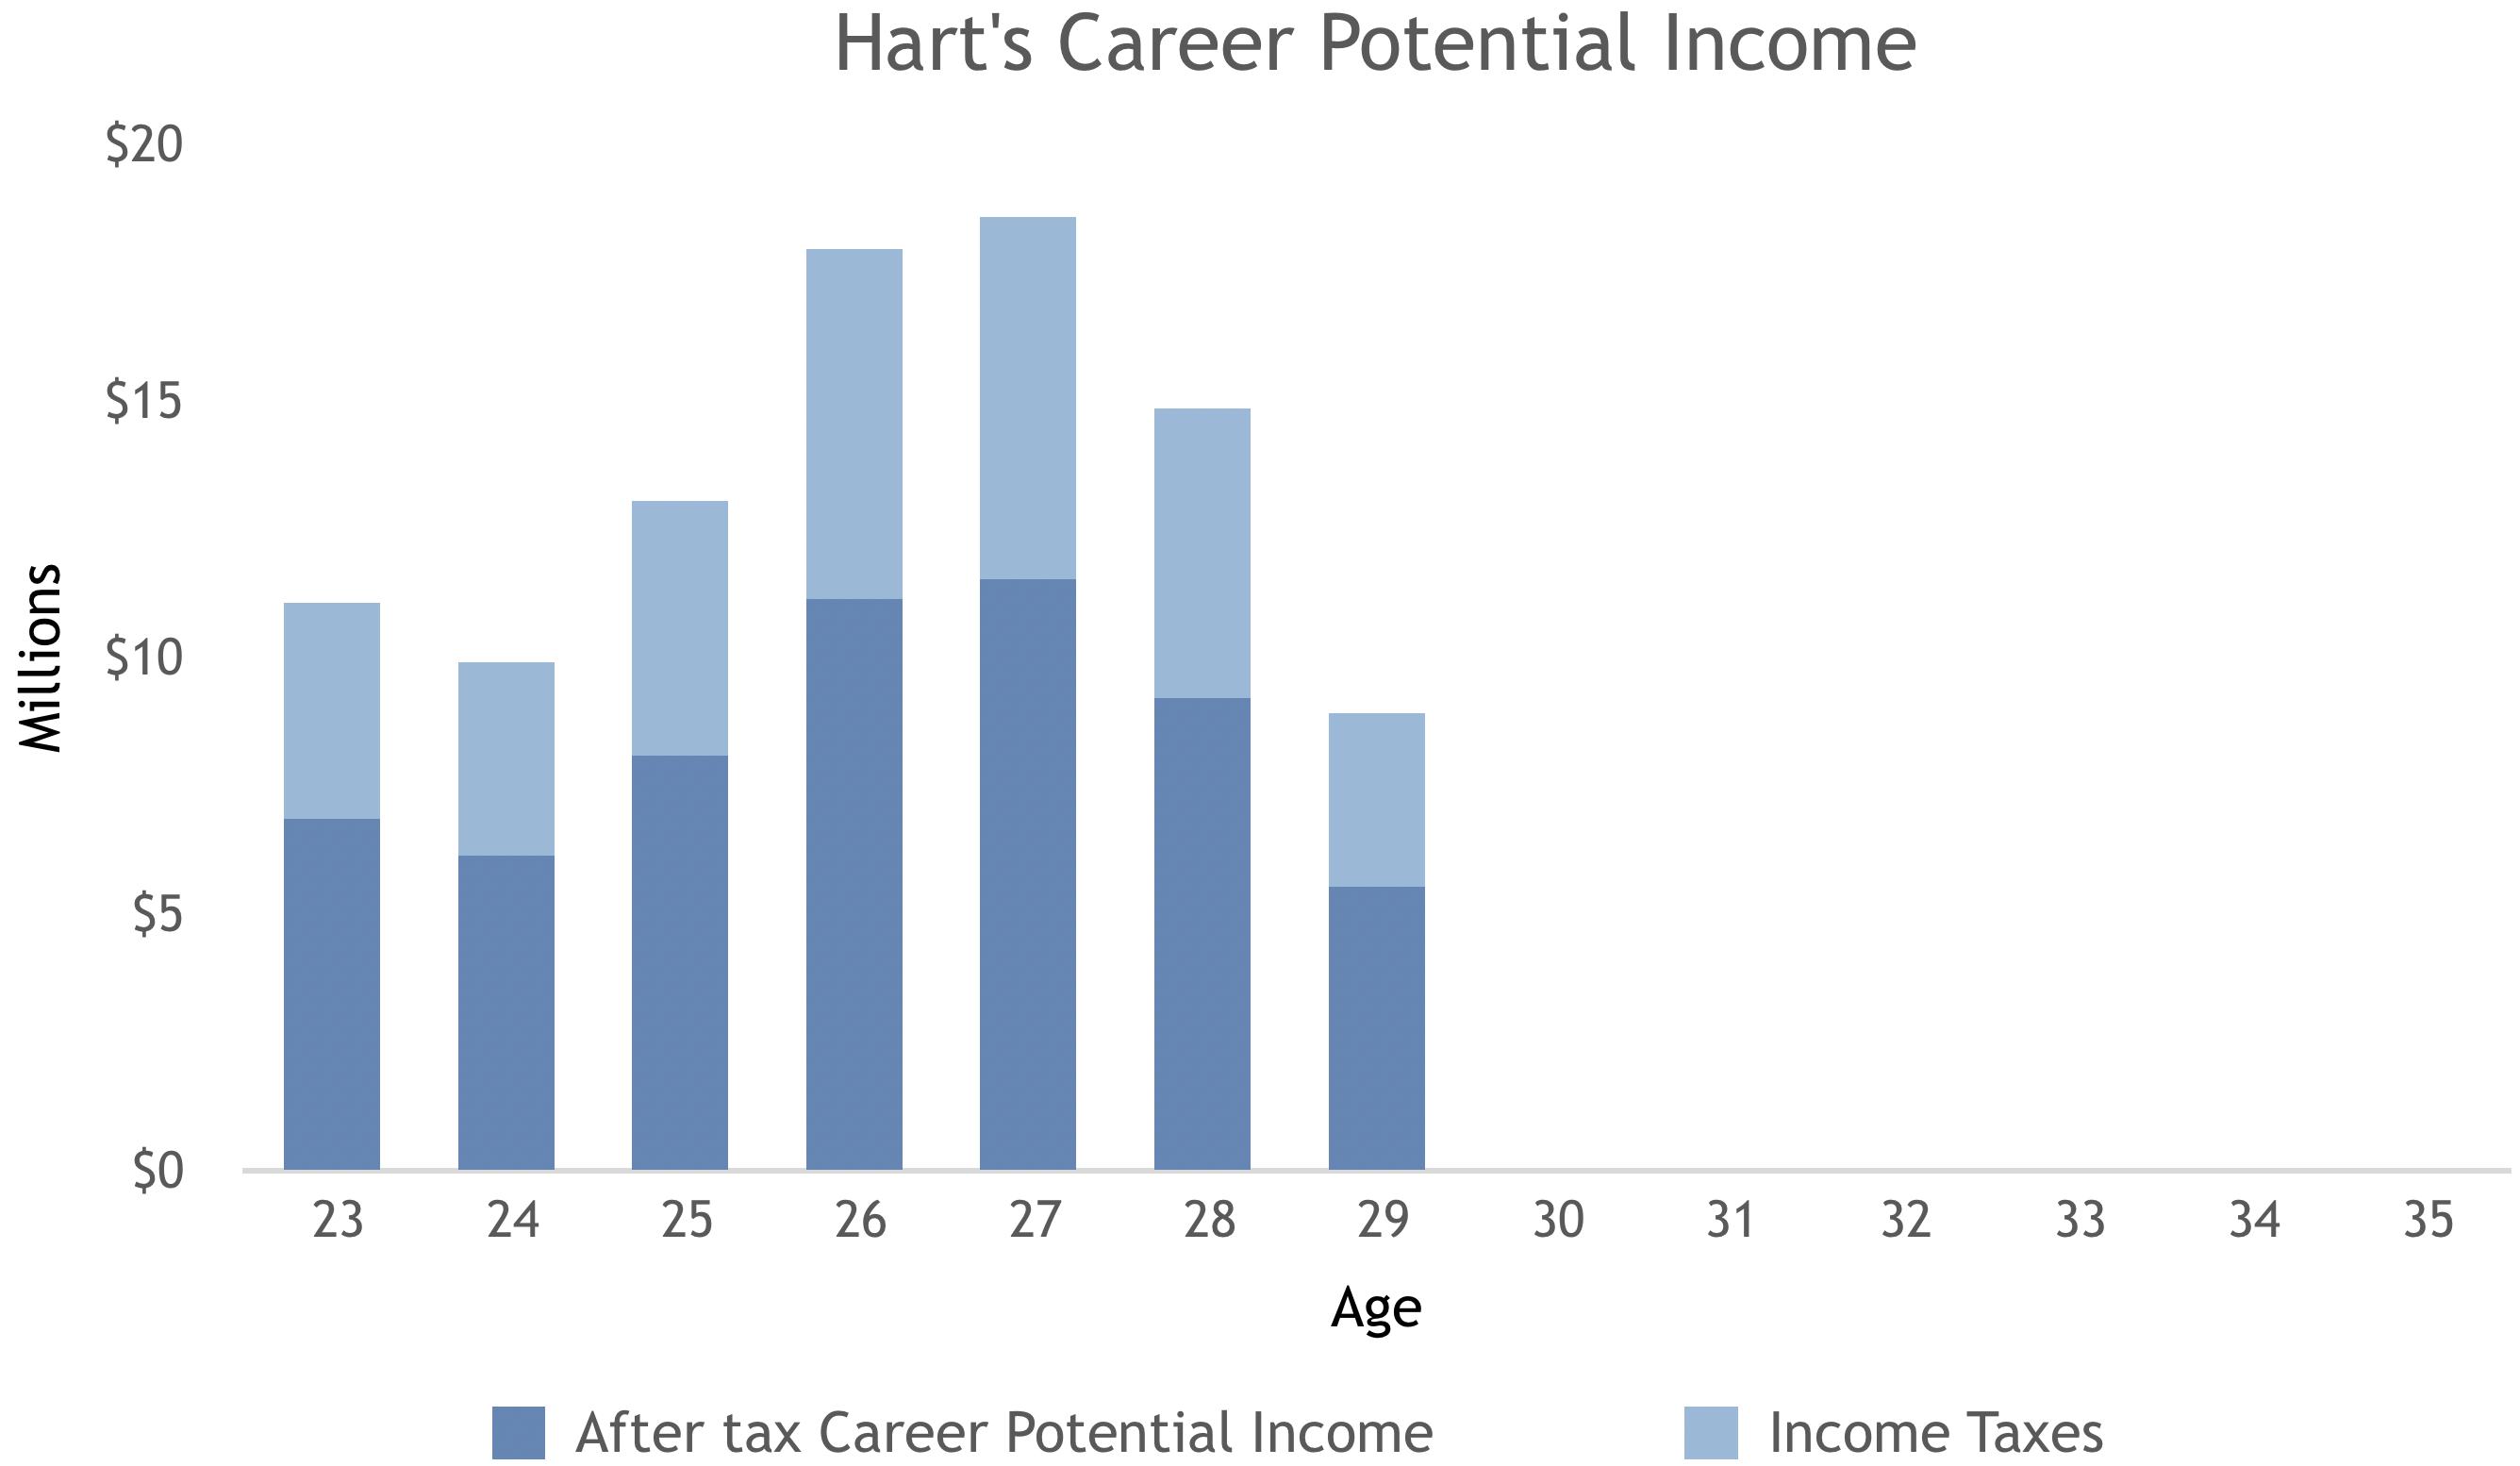 Josh Hart Career Potential Income-1.png